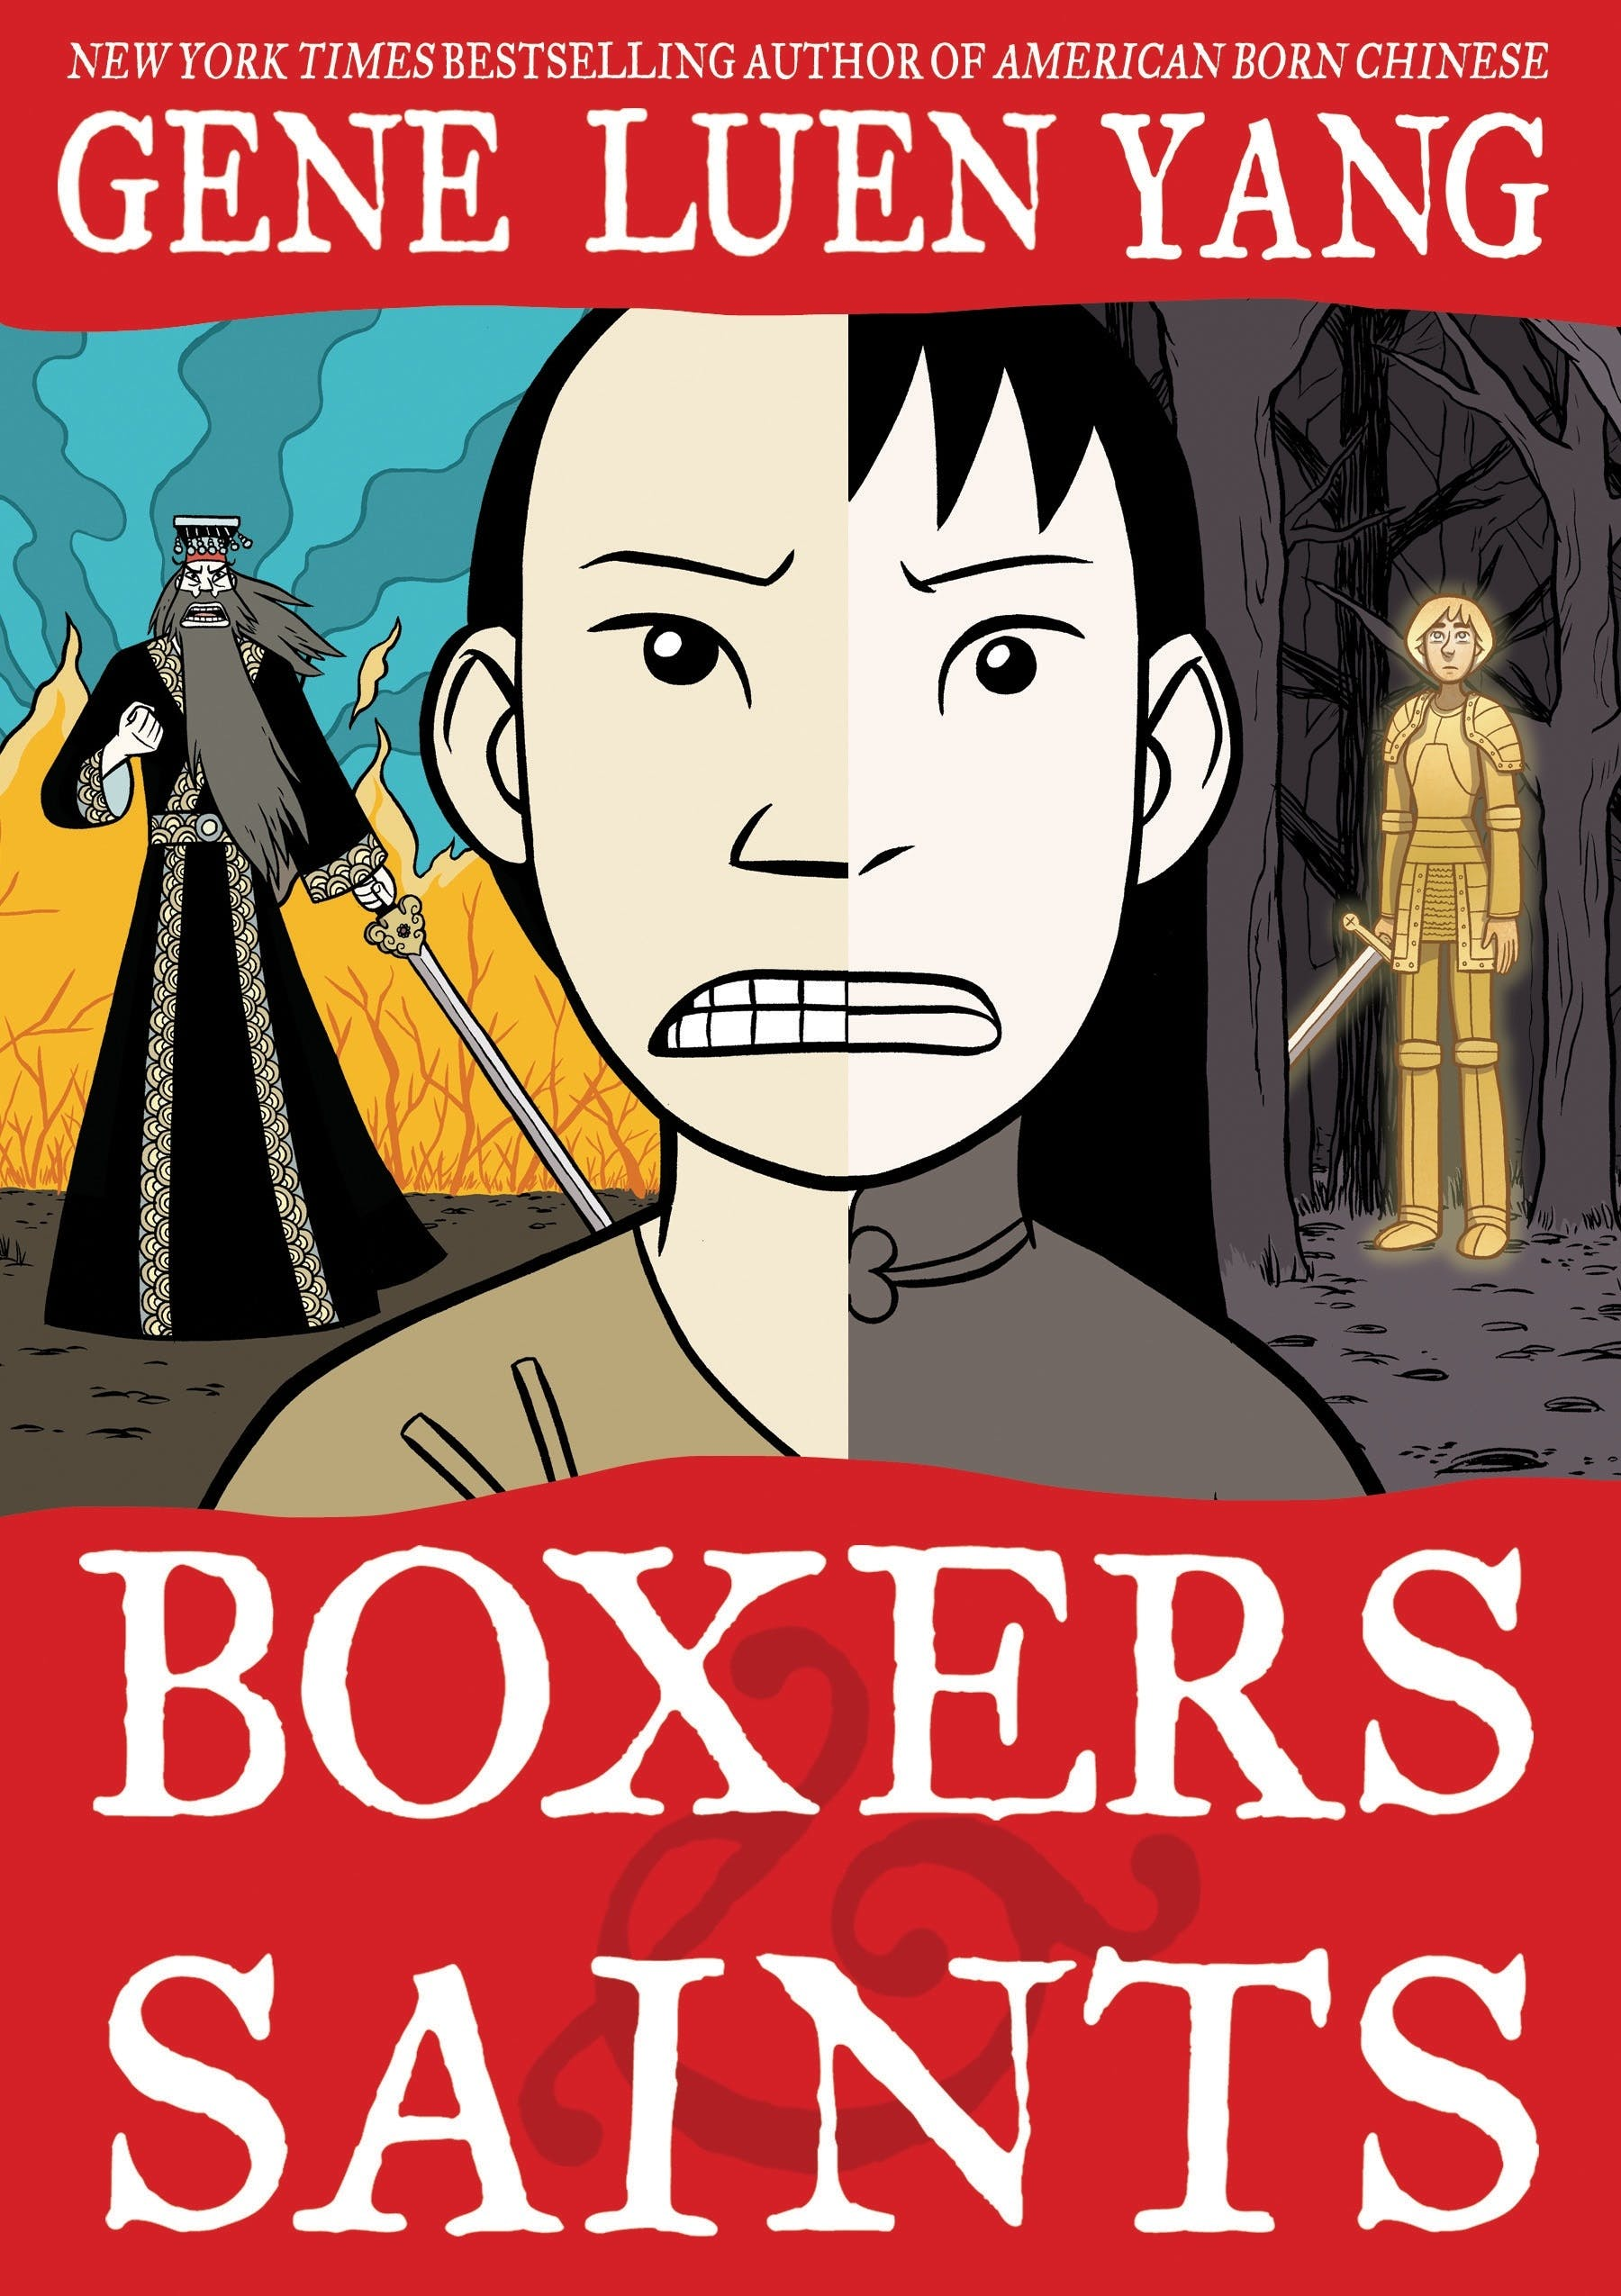 Image of Boxers & Saints